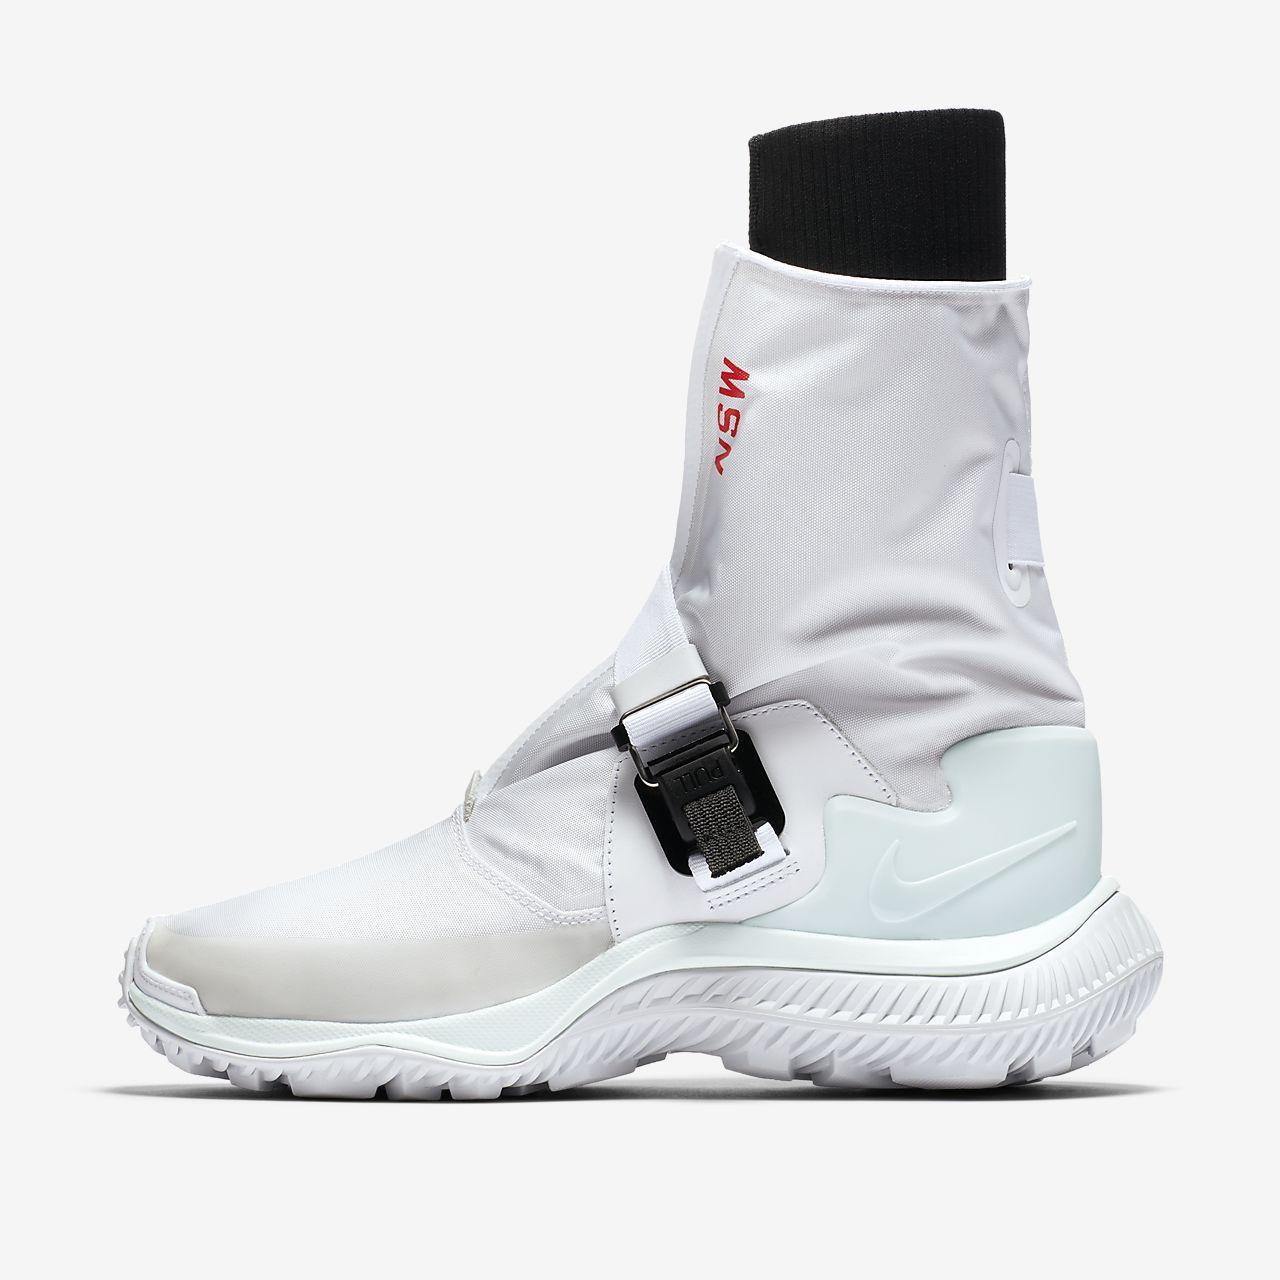 Nike NSW Gaiter Boot High-Top Sneakers